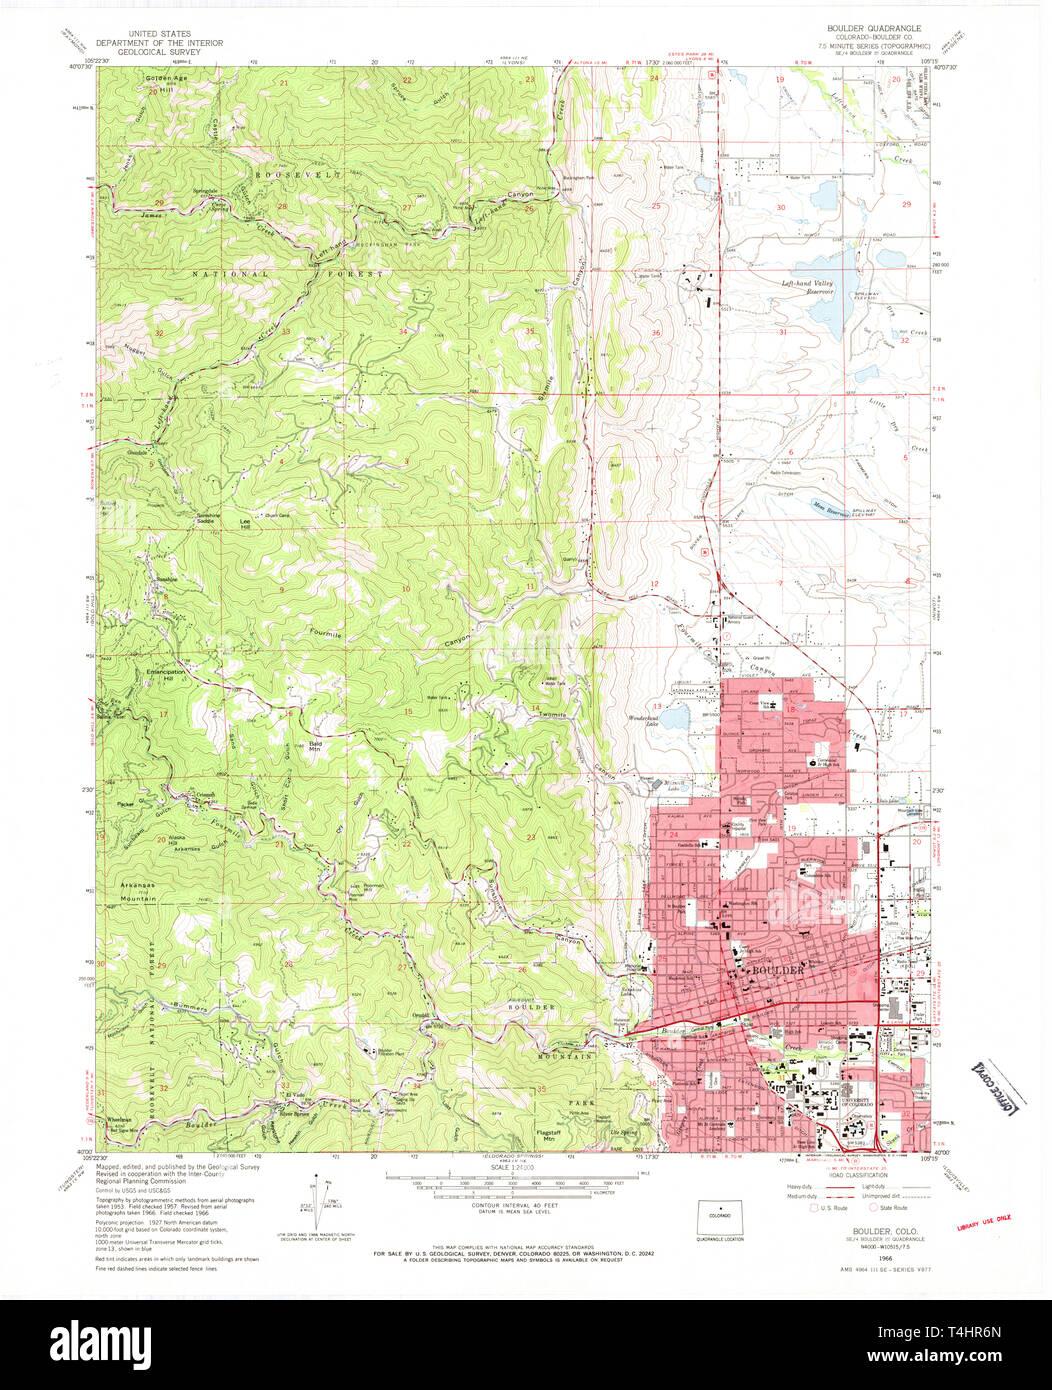 Cortez Topographic Maps Co Ut Usgs Topo Quad 37108a1 At